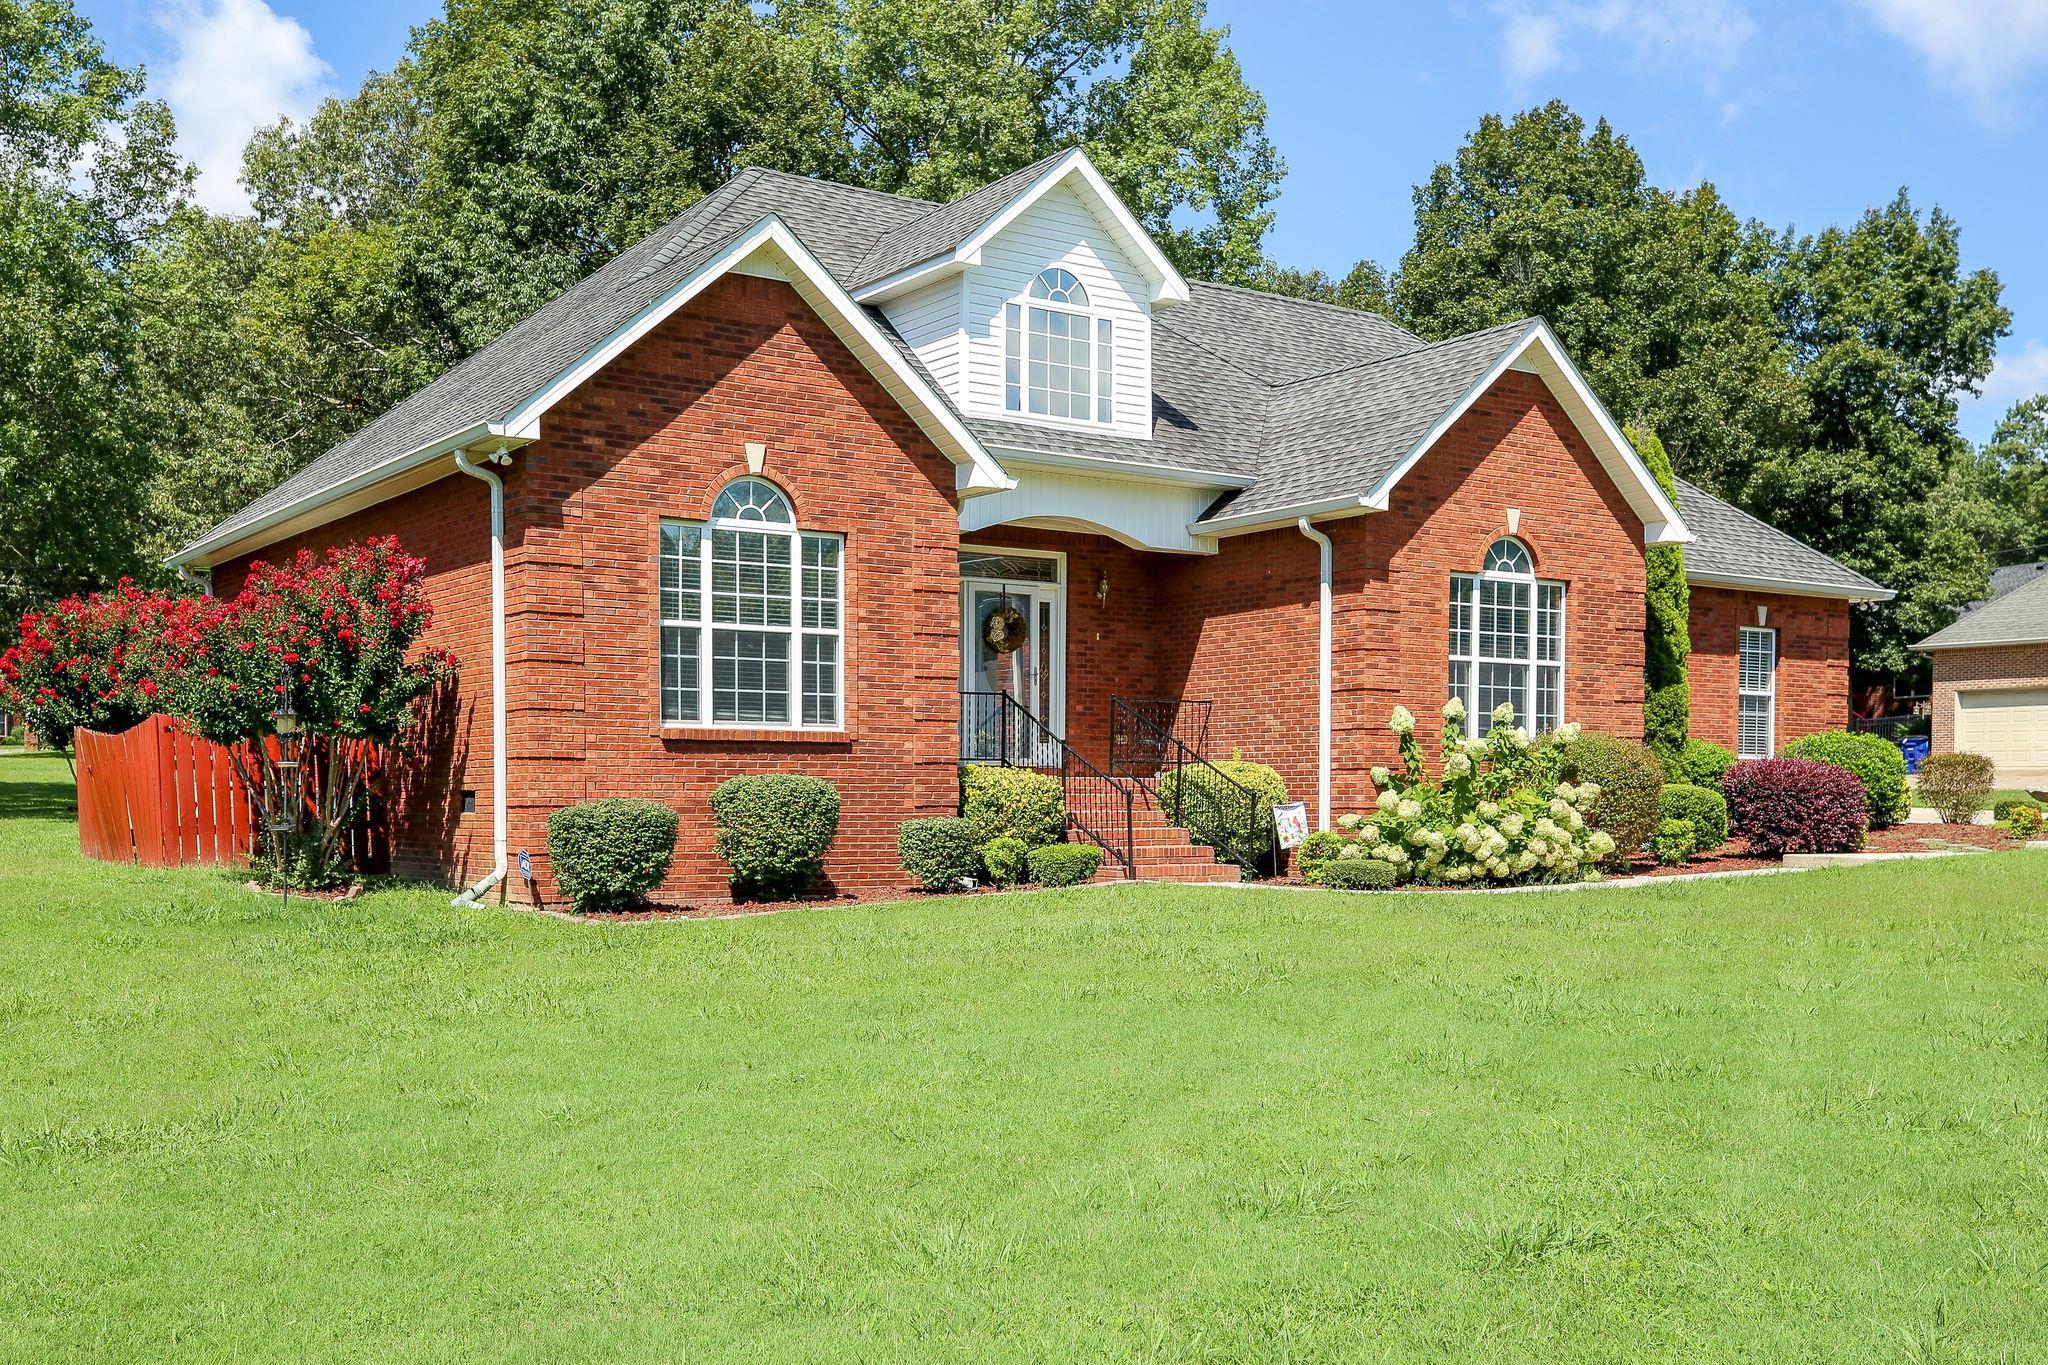 103 Stonegate Cir, Shelbyville, TN 37160 - Shelbyville, TN real estate listing